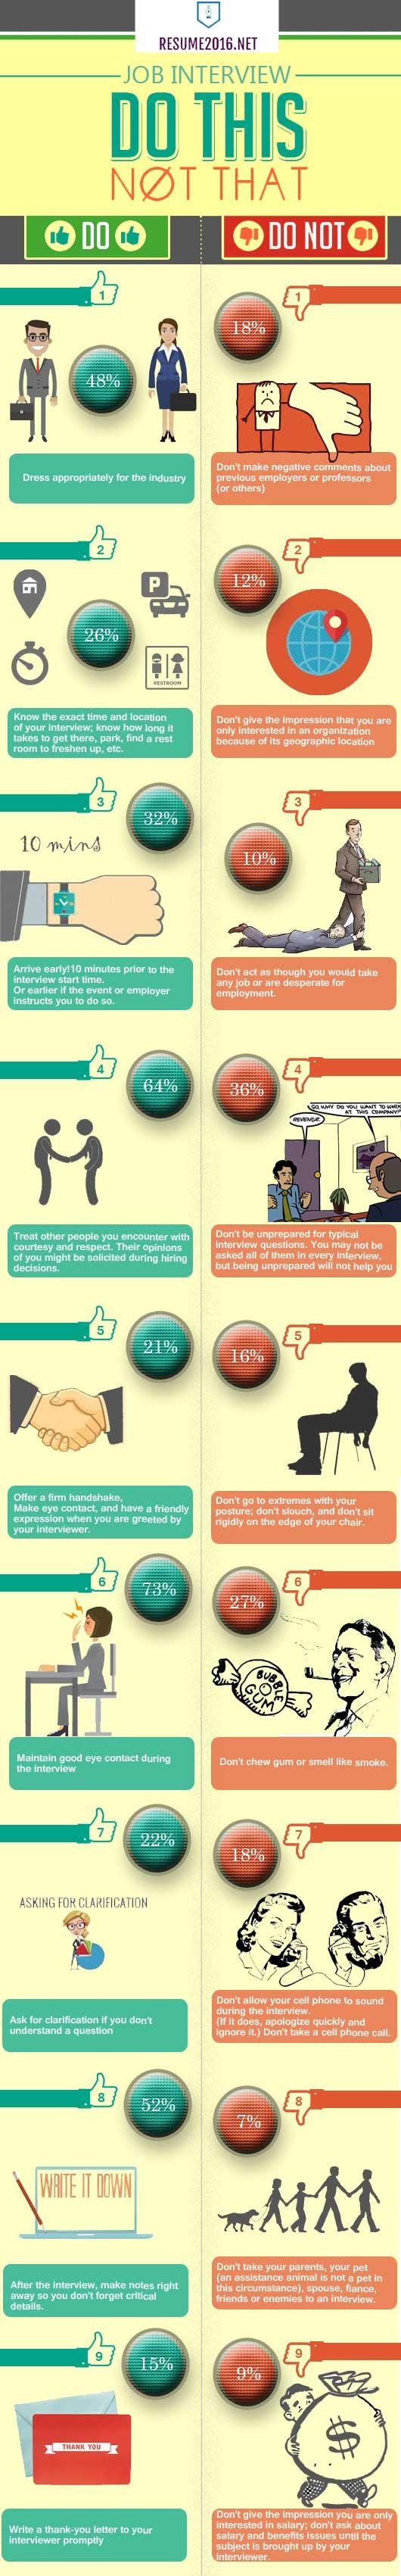 Job Interview Dou0027s And Dontu0027s